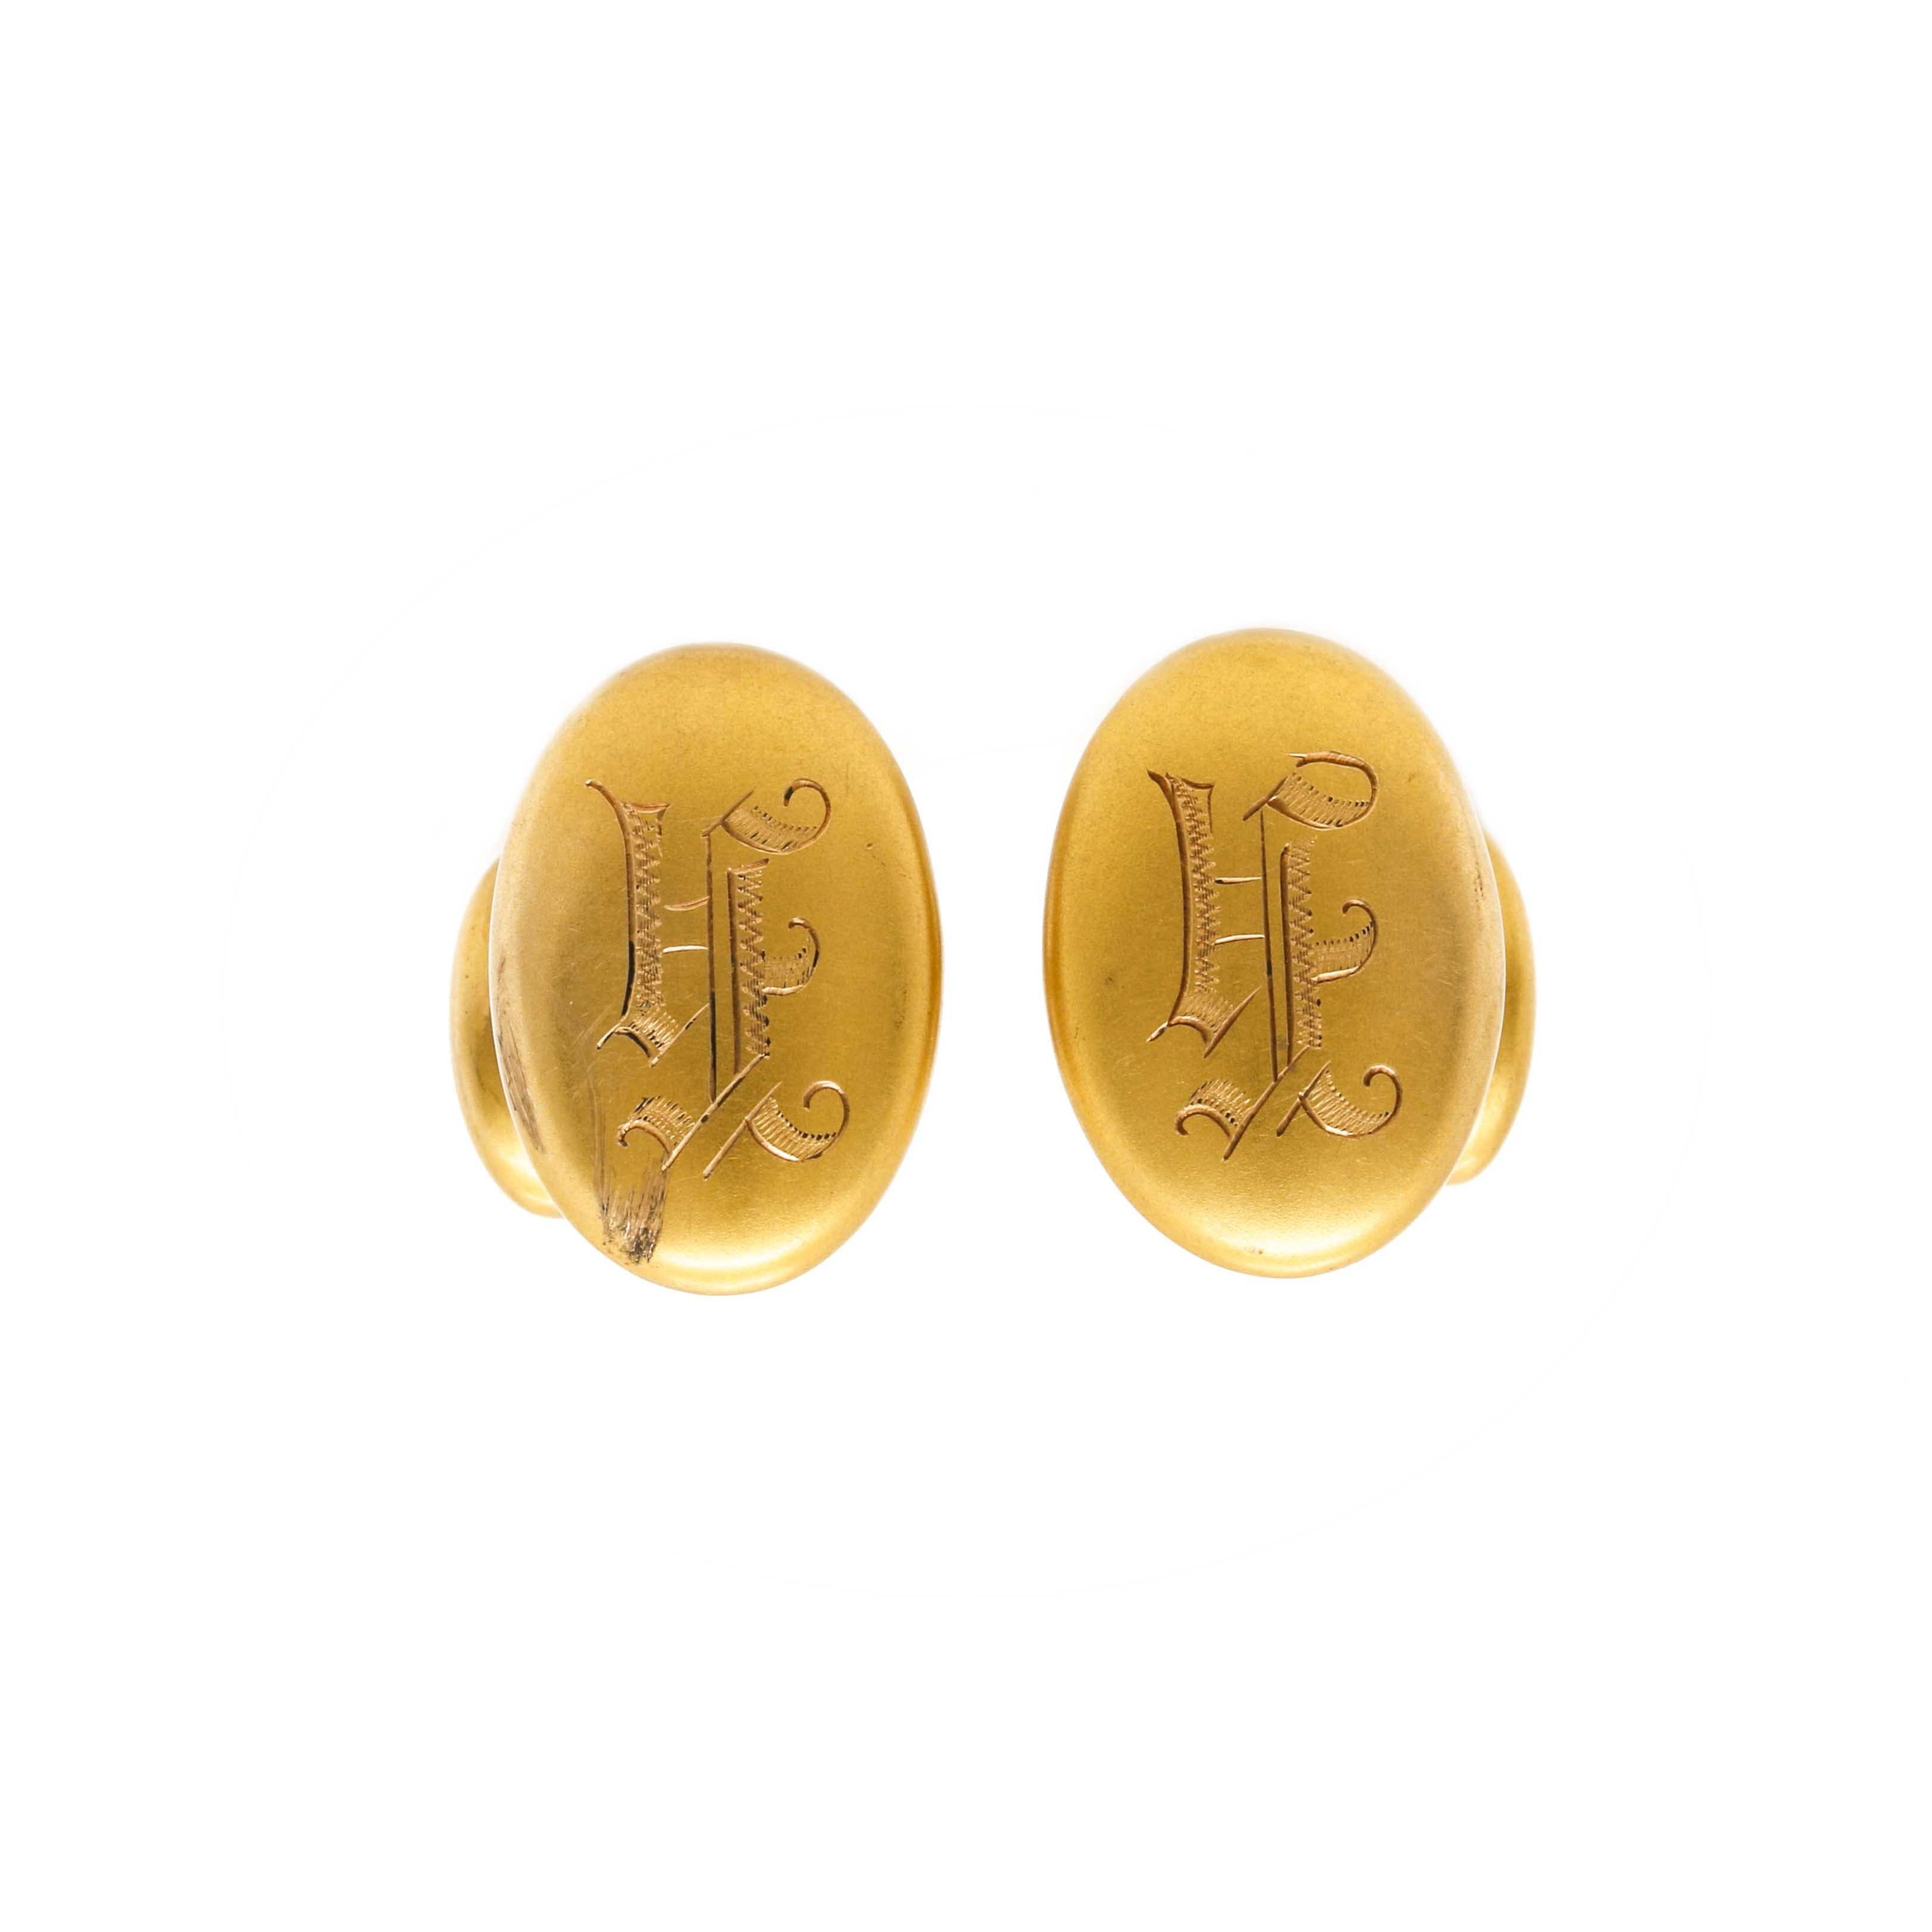 14K Yellow Gold Engraved Cufflinks